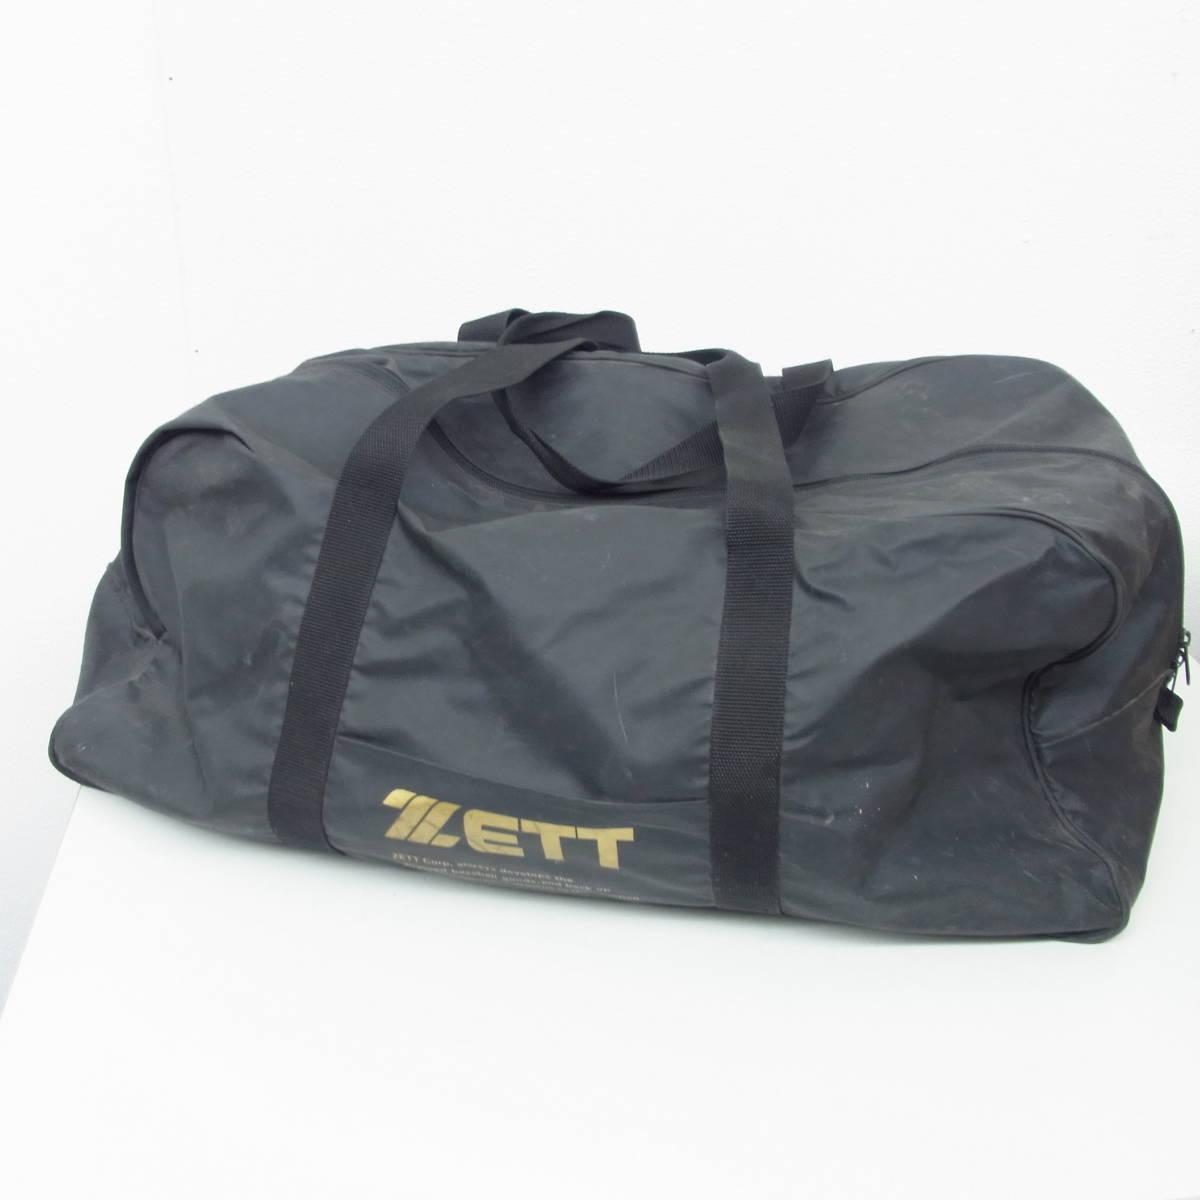 MIZUNO ミズノ ZETT ゼット 野球 ベースボール ヘルメット 5点セット J.S.B.B L×2 M×2 O×1 バッグ付き 難有特価_画像6